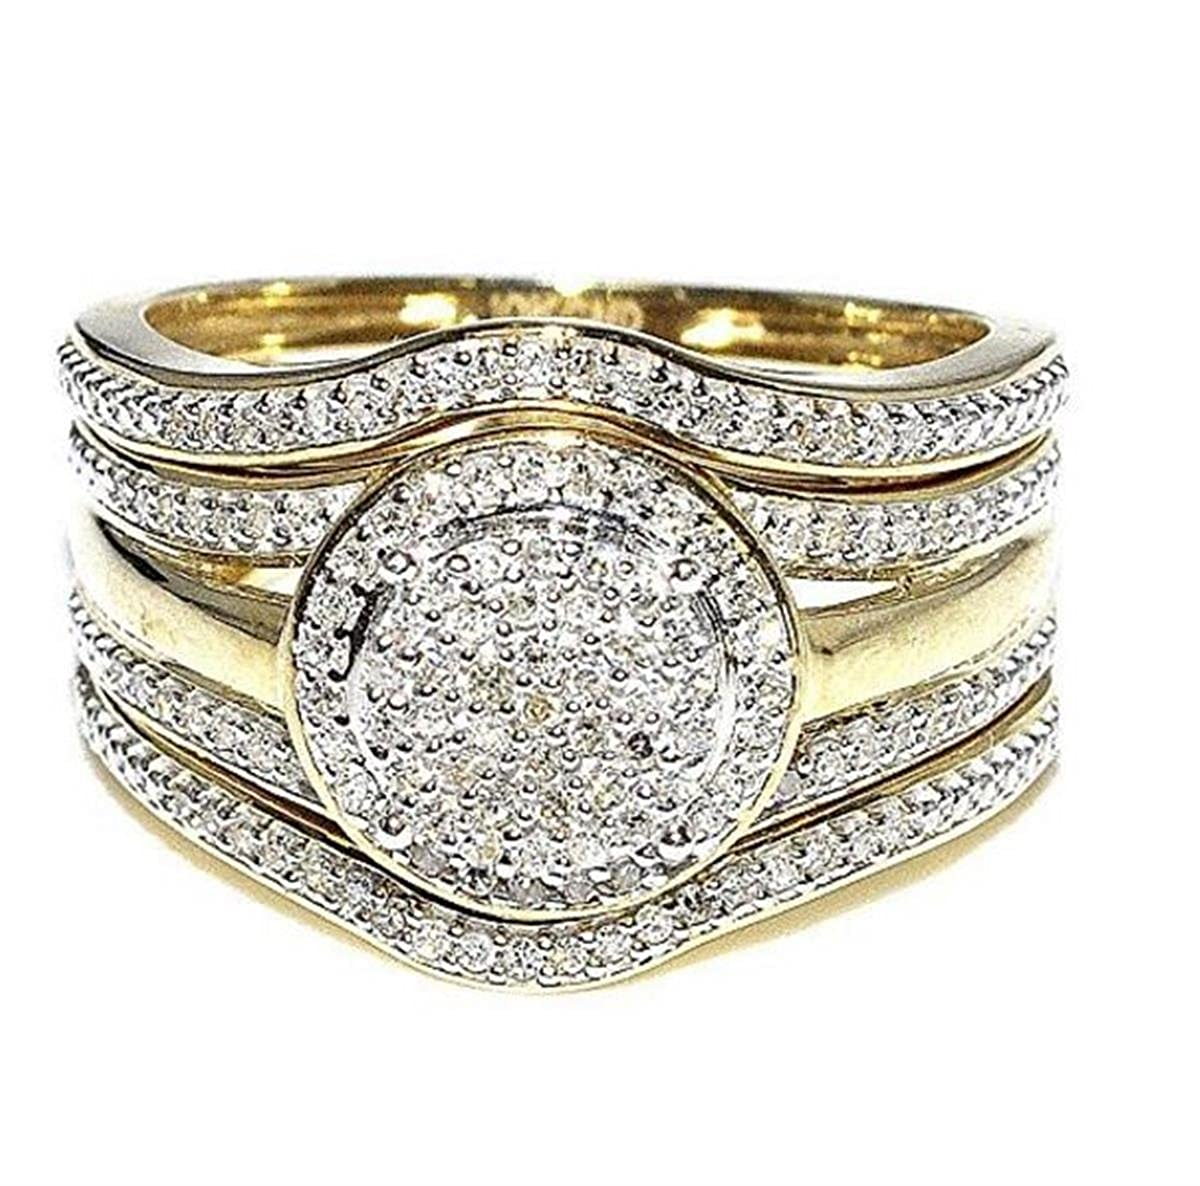 Midwest Jewellery Yellow Gold Wedding Rings Set 12mm Wide 3 Piece Set 1 3cttw Diamonds I2 I3 I J